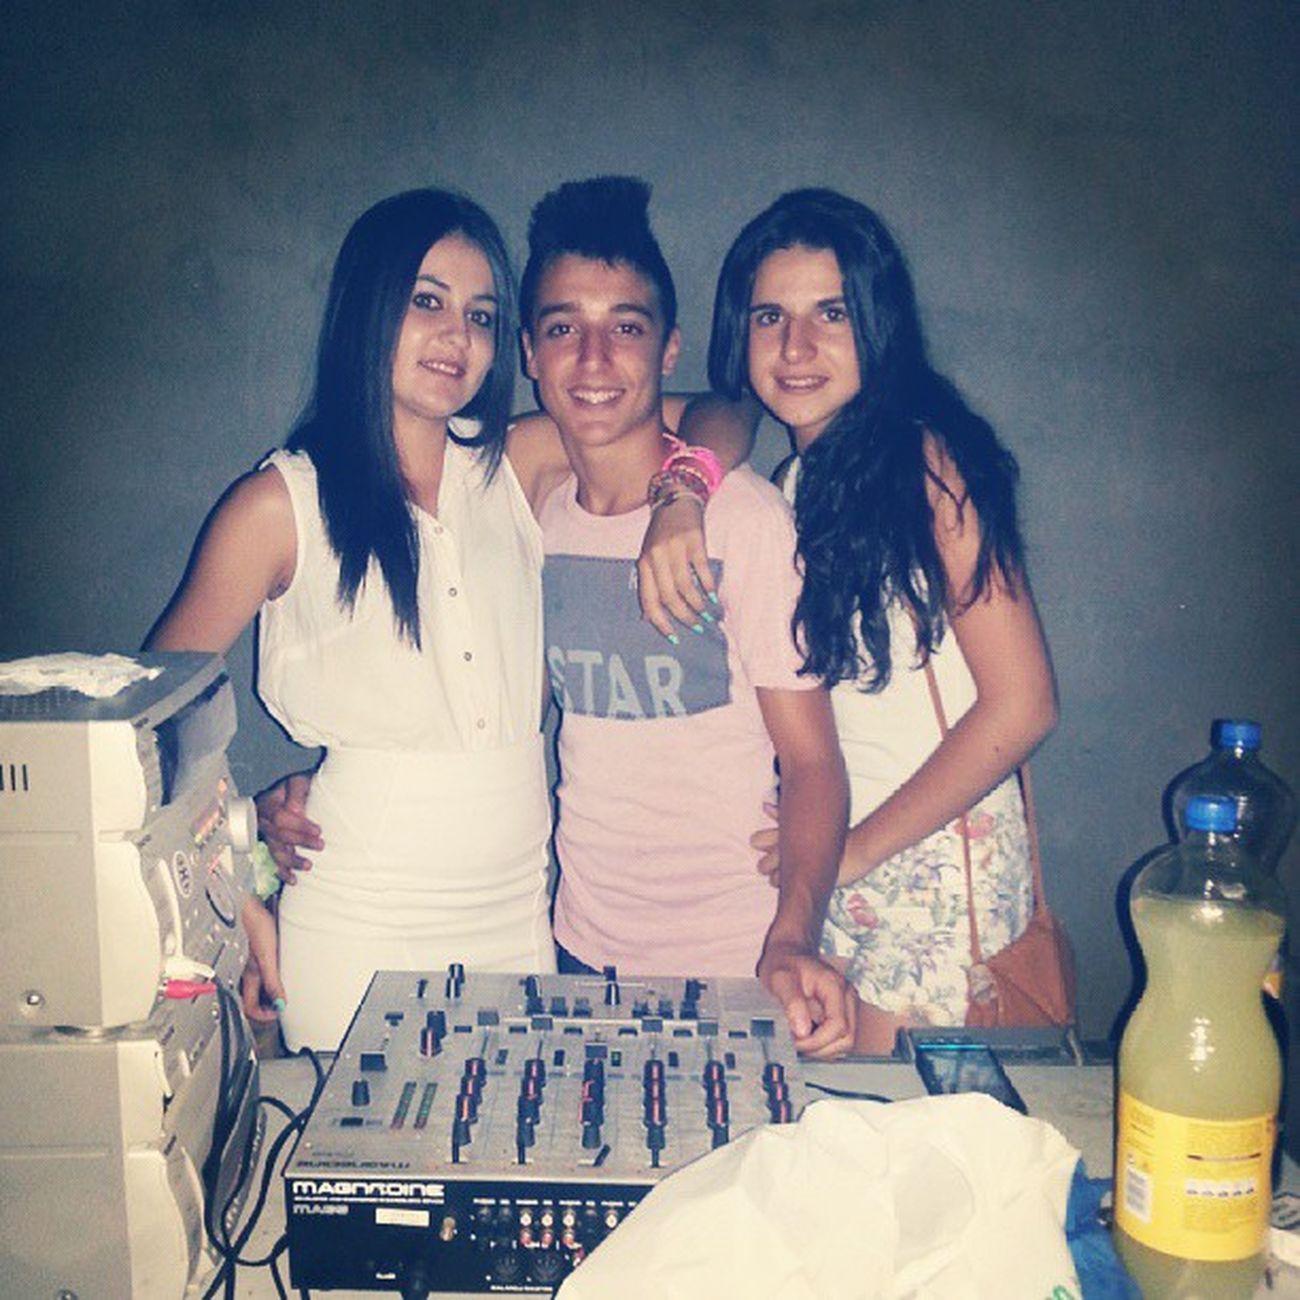 Lunes Ibicenca Fiesta @hernandezluci10 JOSE :)